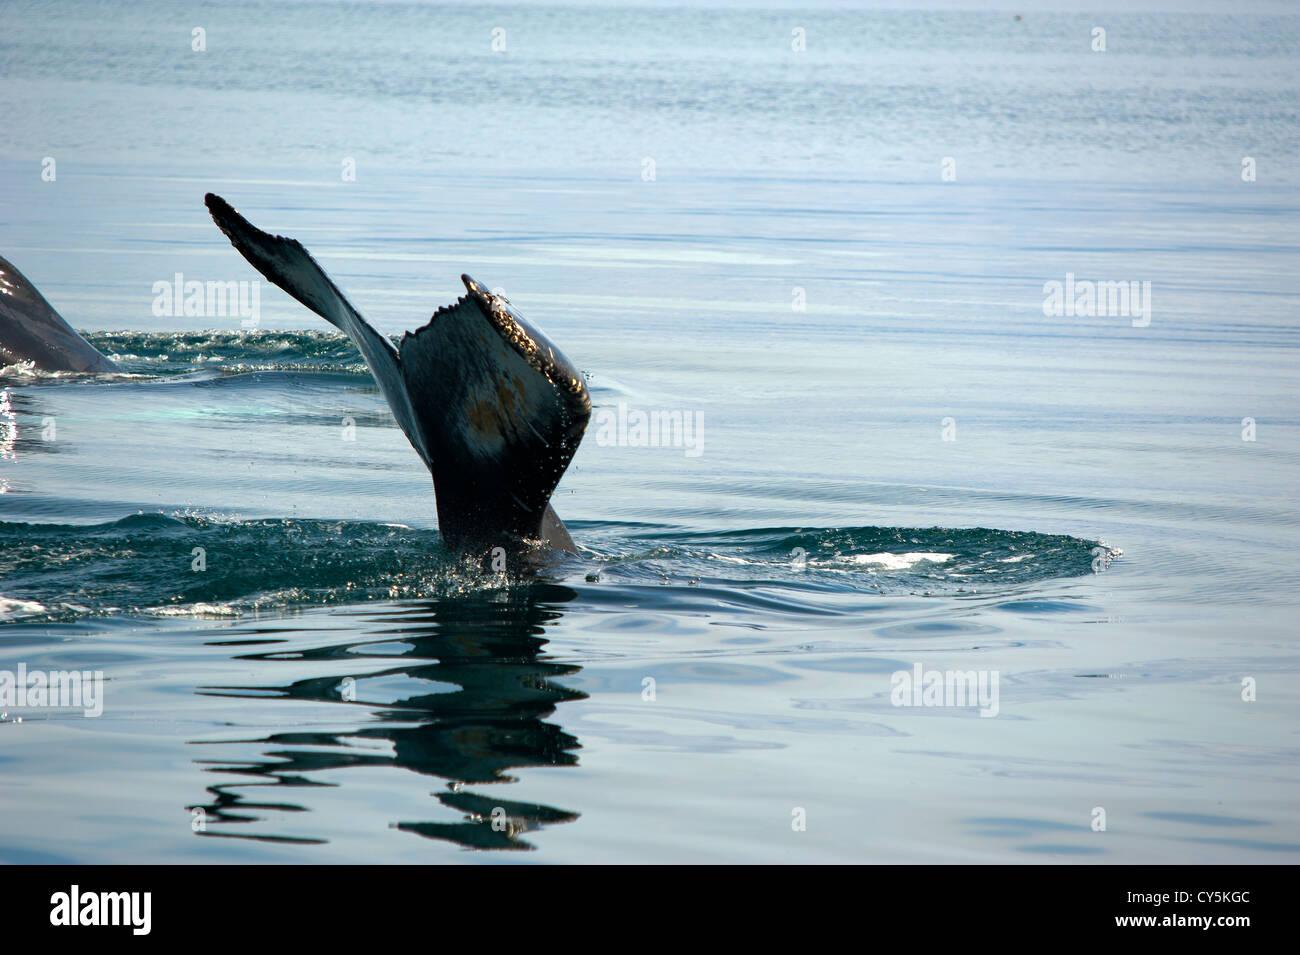 Whale's tail, Husavik Iceland - Stock Image